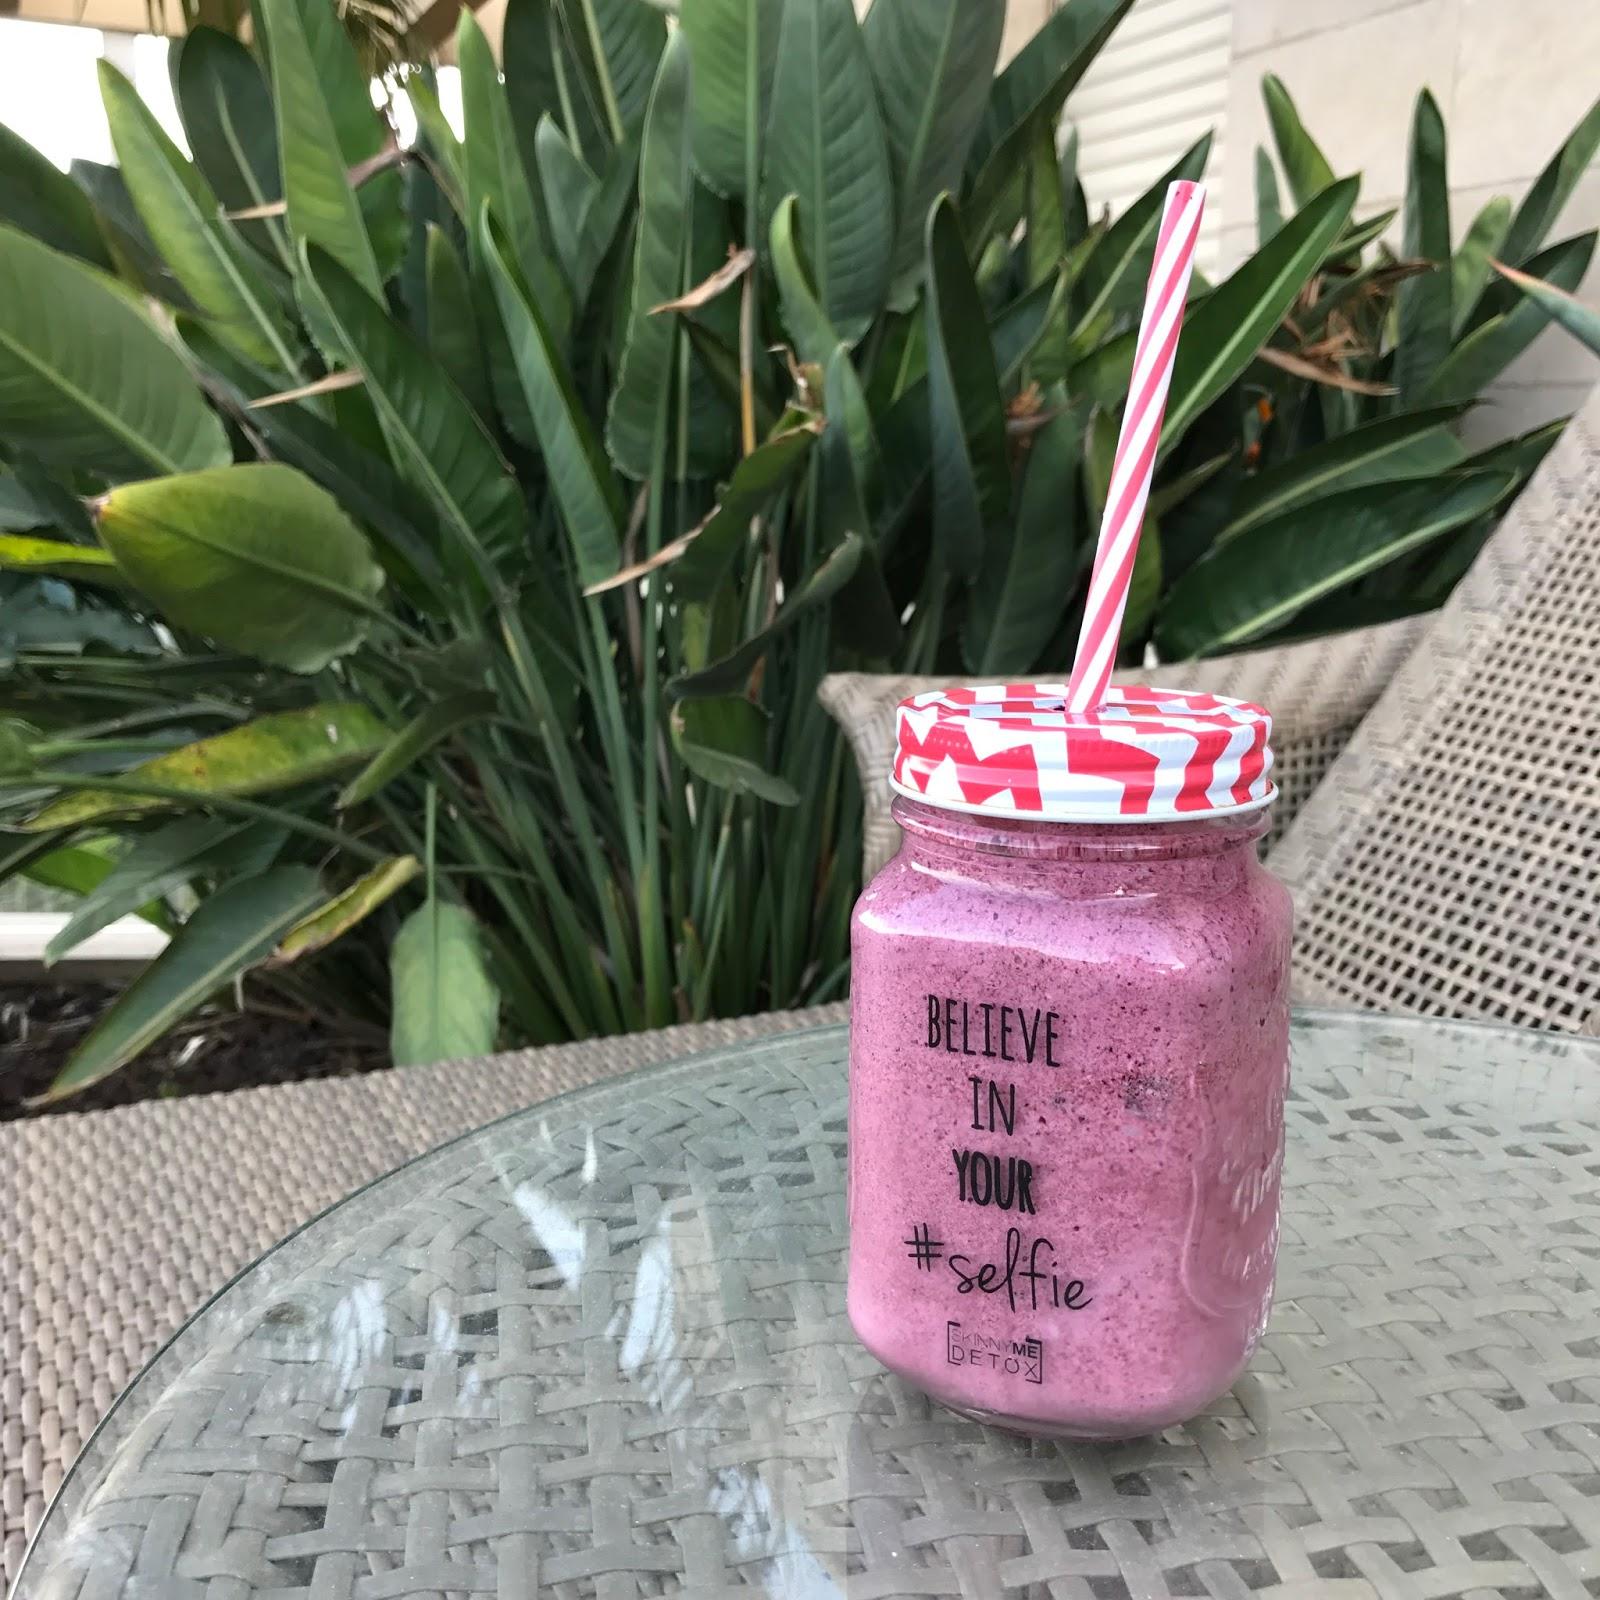 ניקוי רעלים סקיני מי דיטוקס - סמודי אוכמניות - skinny me detox blberries smoothie